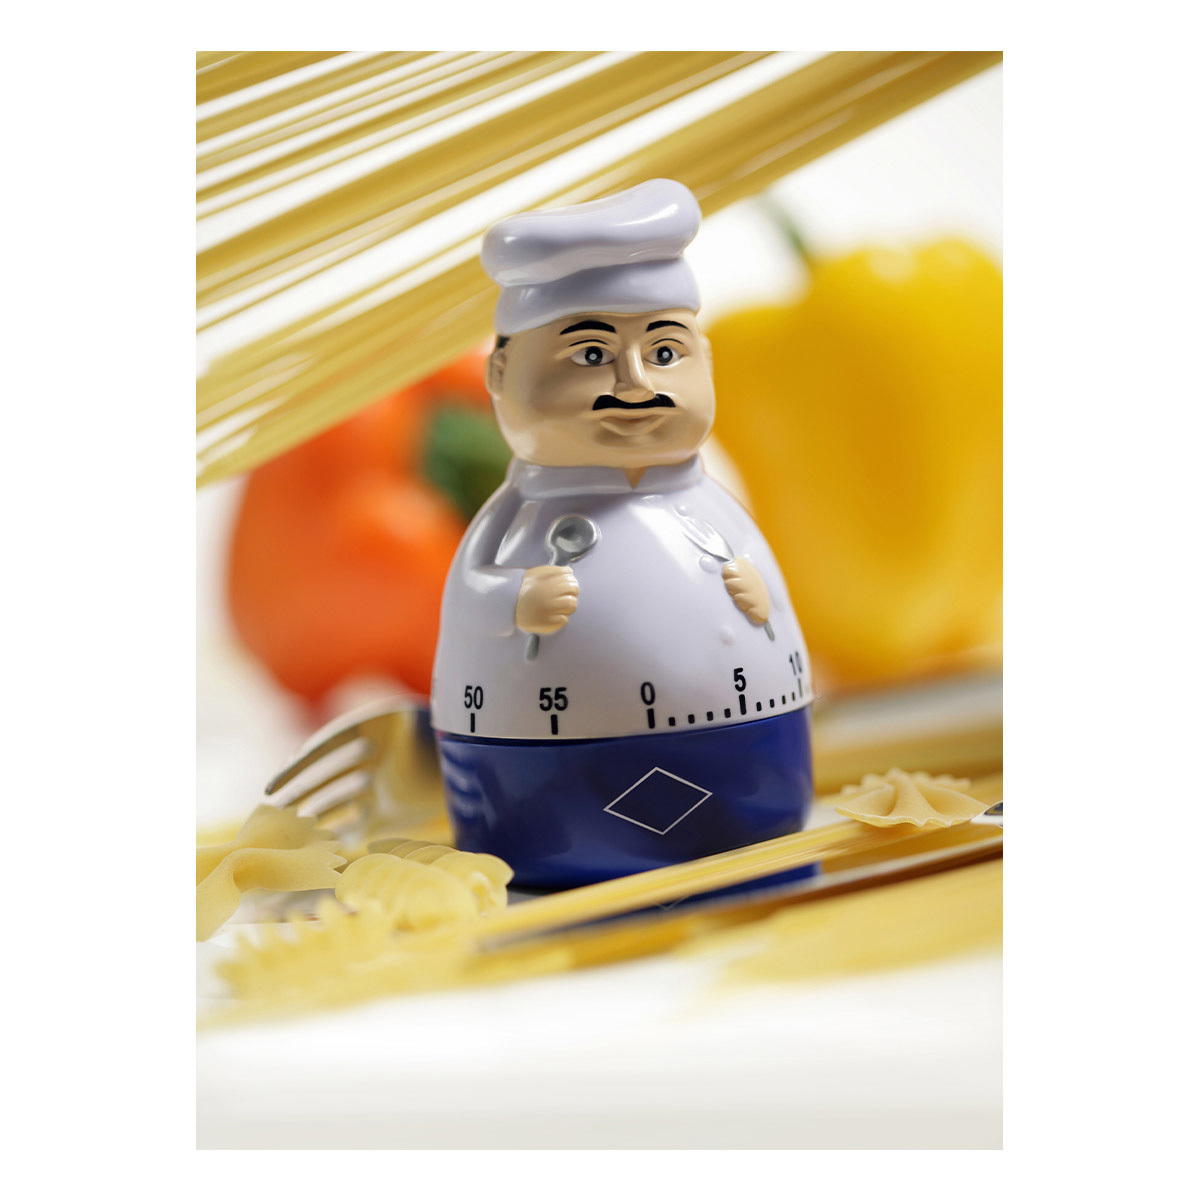 38-1008-analoger-küchen-timer-koch-anwendung-1200x1200px.jpg